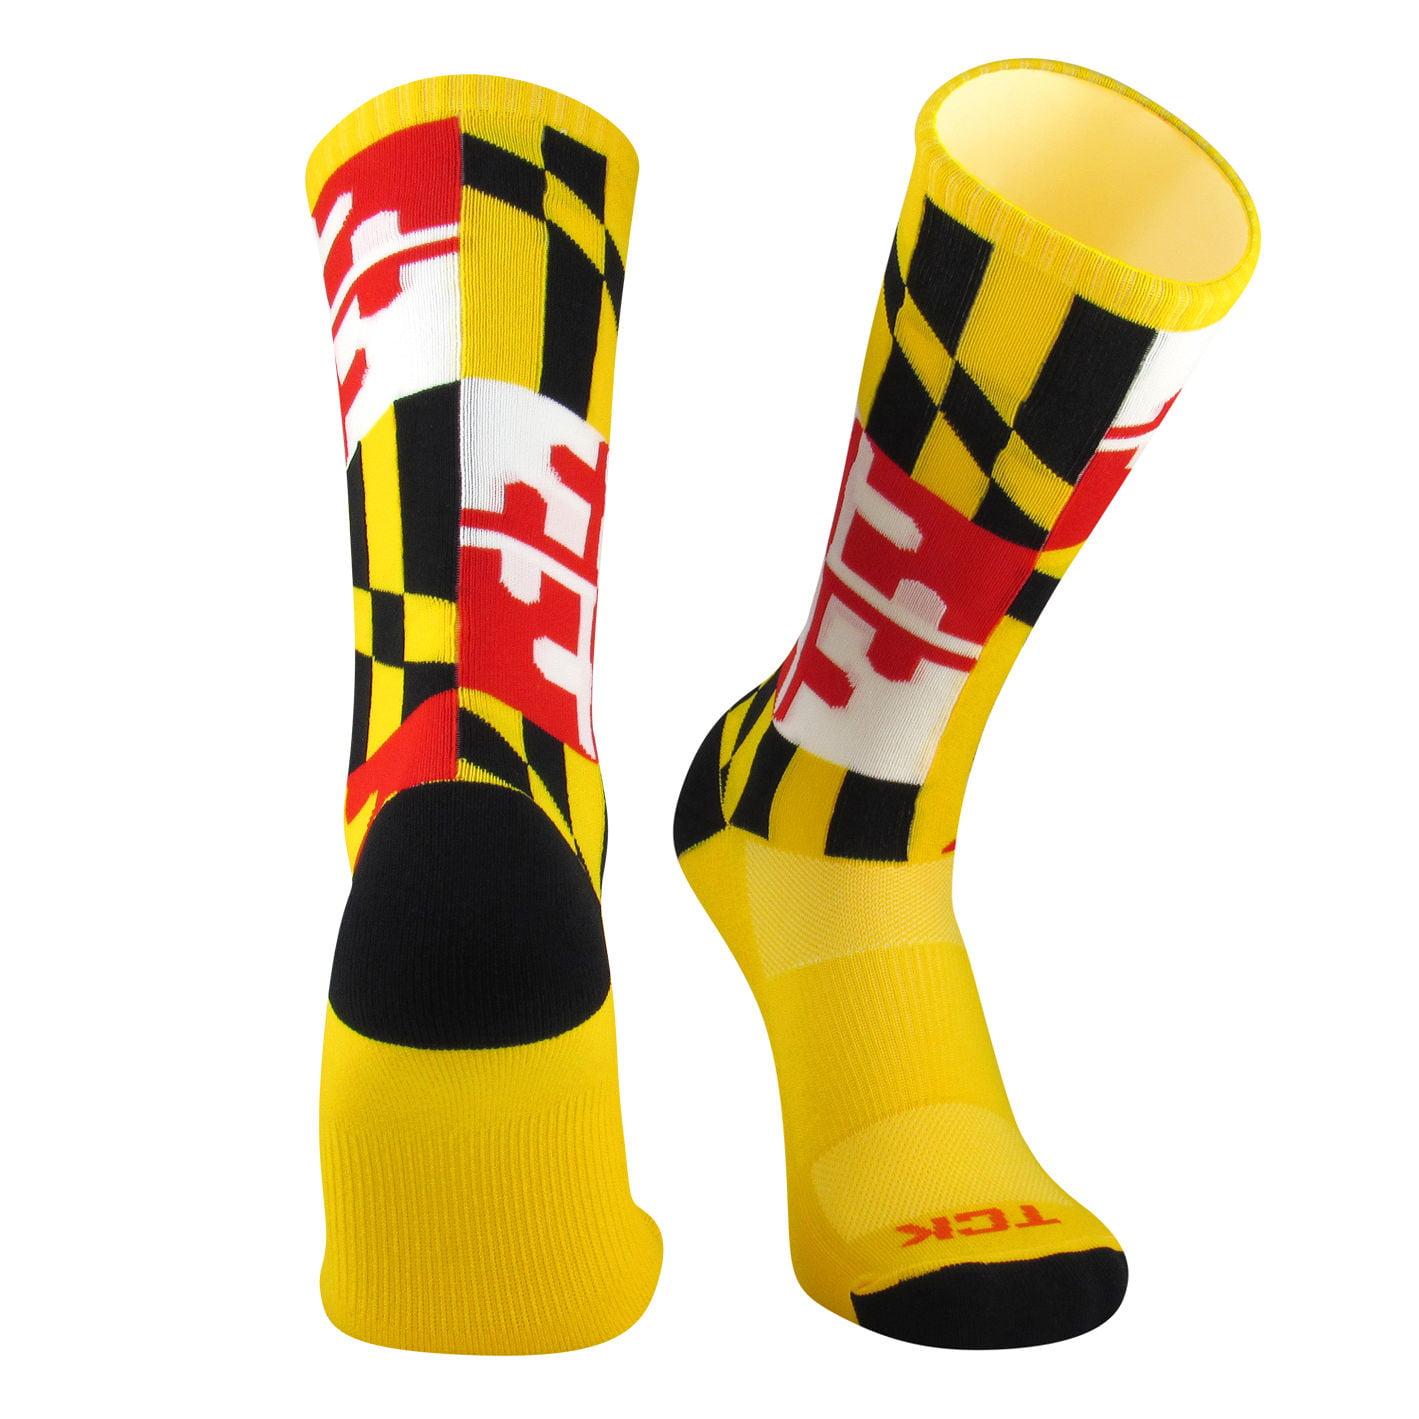 TCK Elite Flag Socks - MARYLAND 2.0 - Gold/White/Red/Black - proDRI, NWT